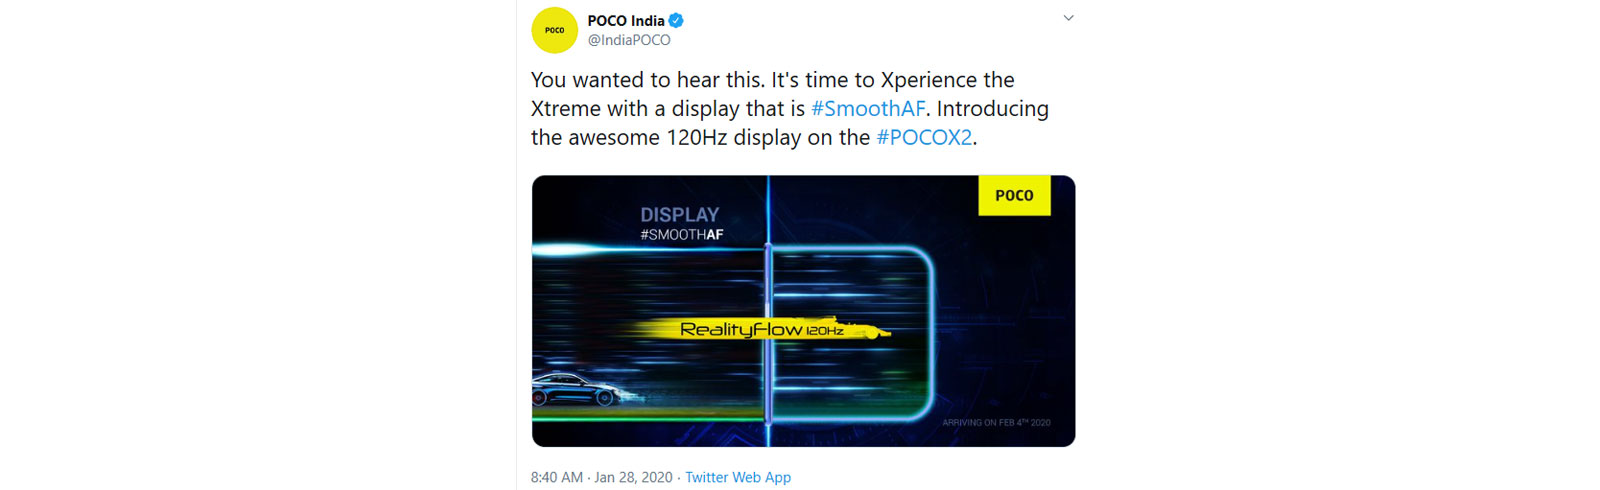 Confirmed: Poco X2 will have a 120Hz display